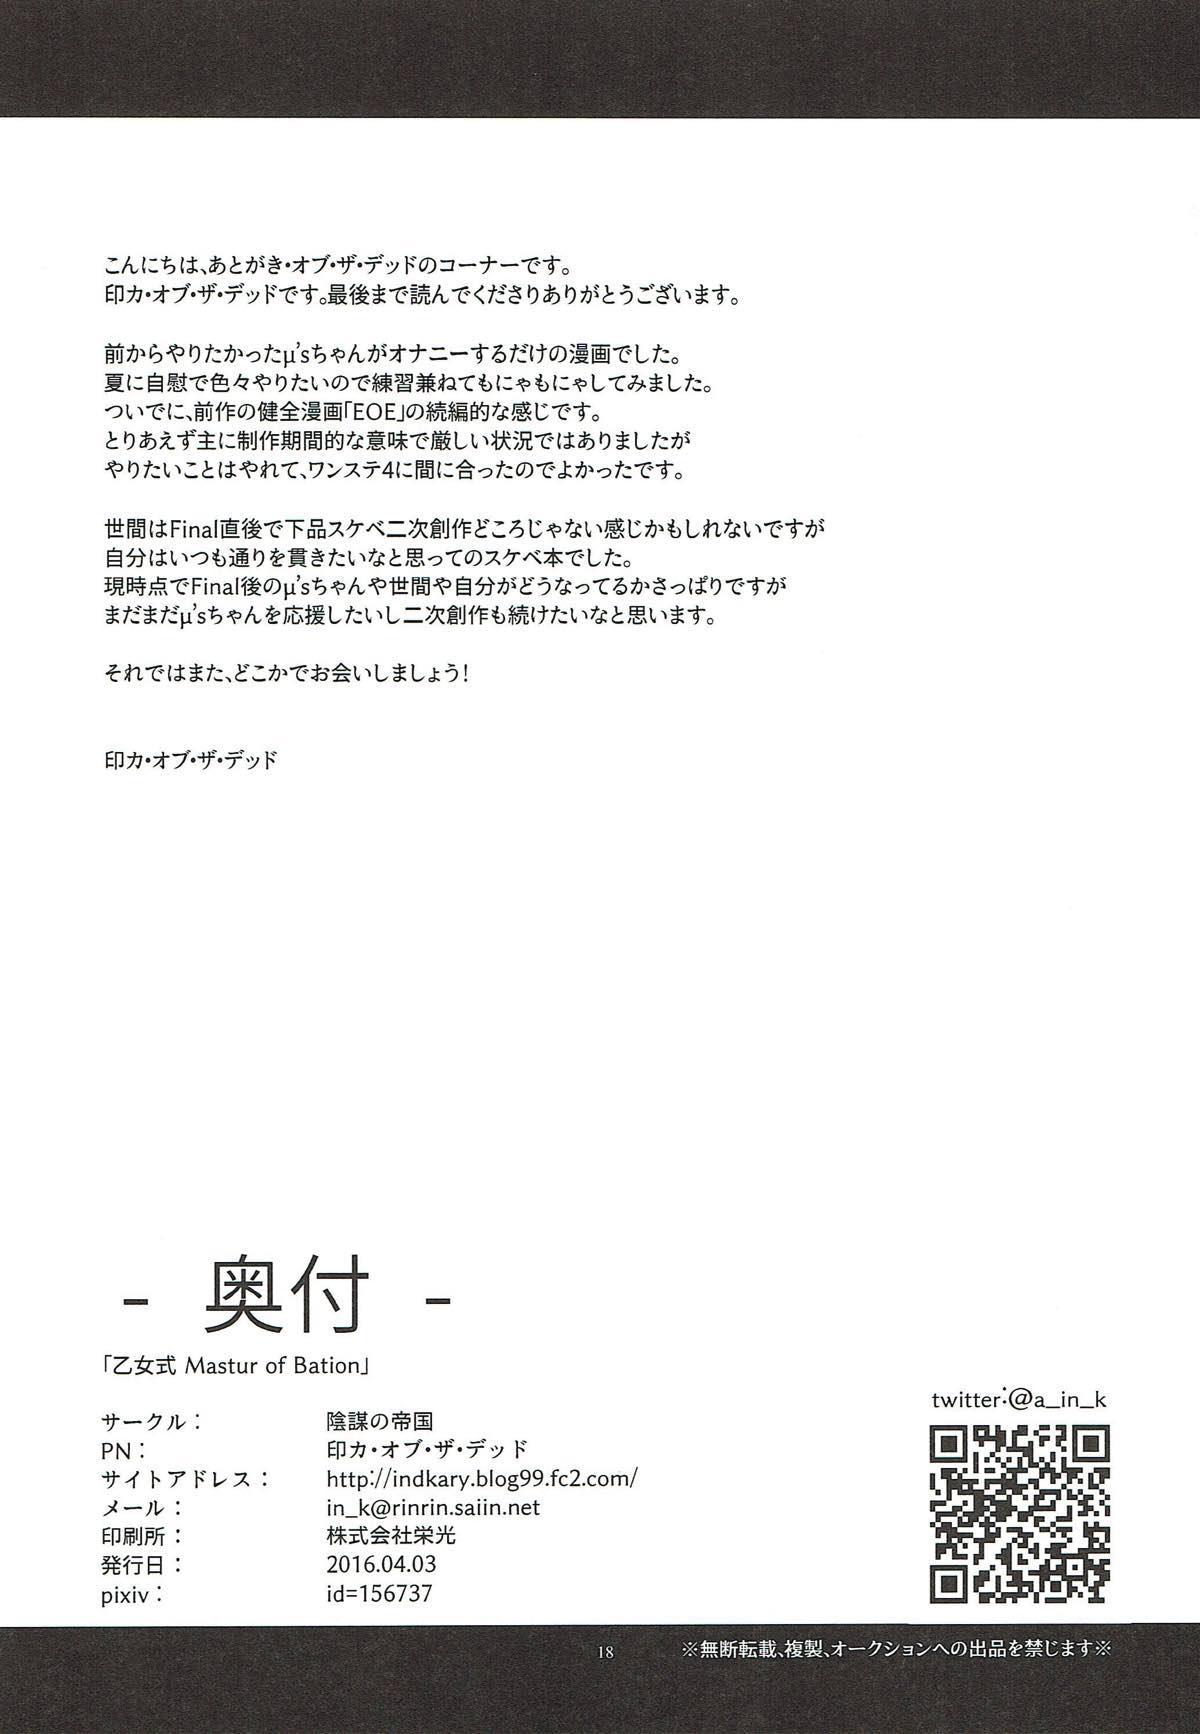 Otome-shiki Mastur of Bation 16